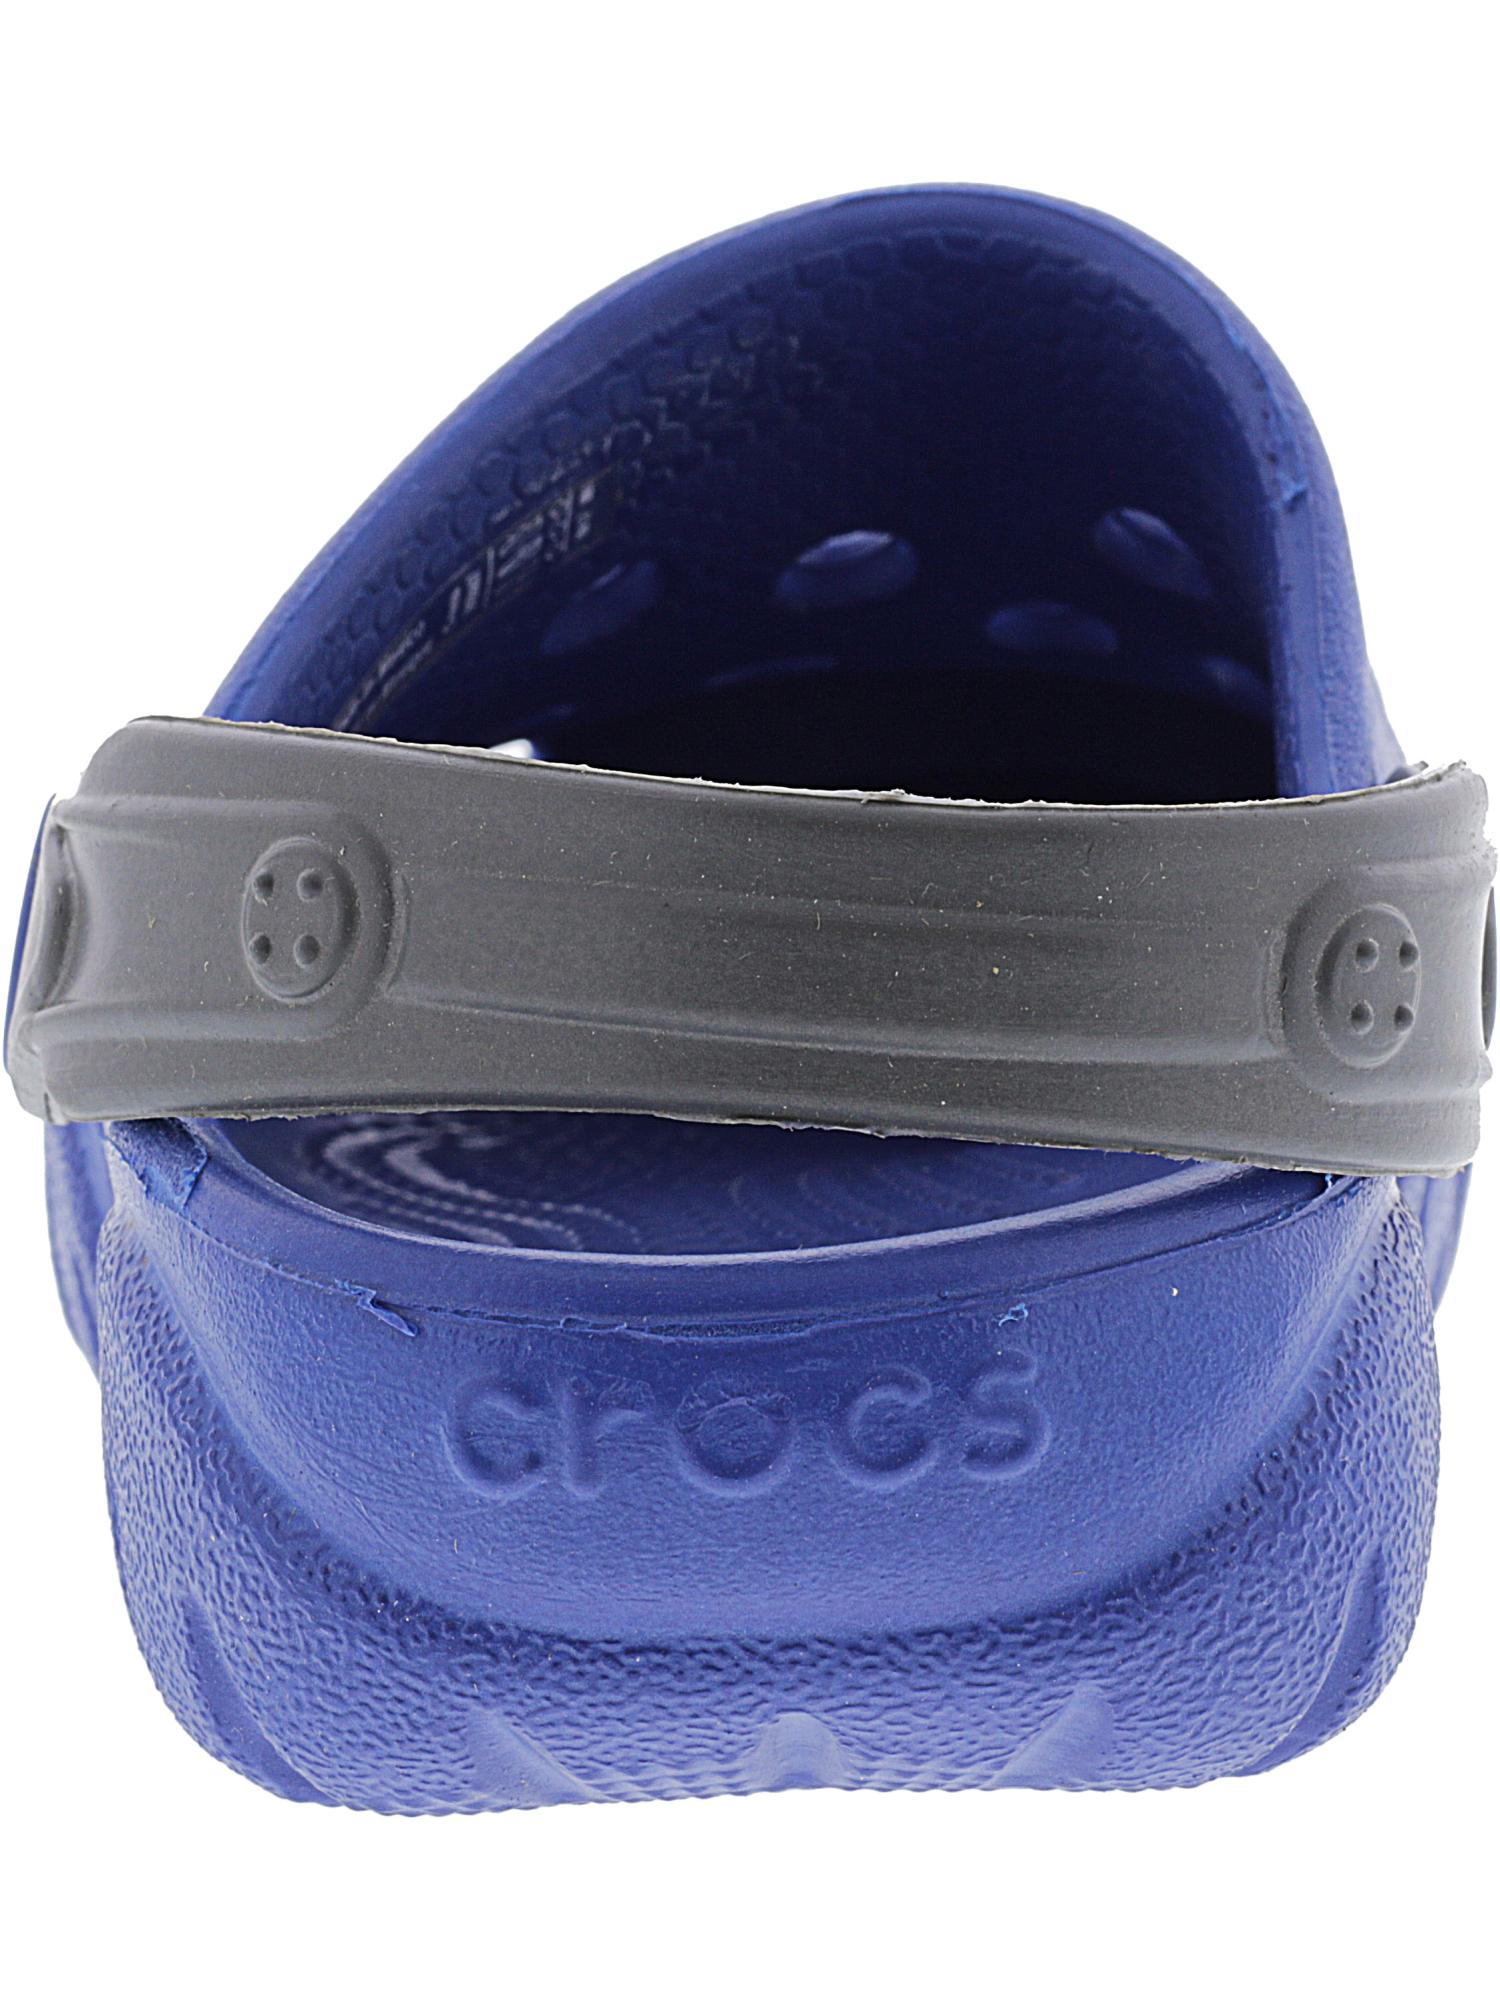 Crocs-Kids-Swiftwater-Clog-Ltd-Clogs thumbnail 9